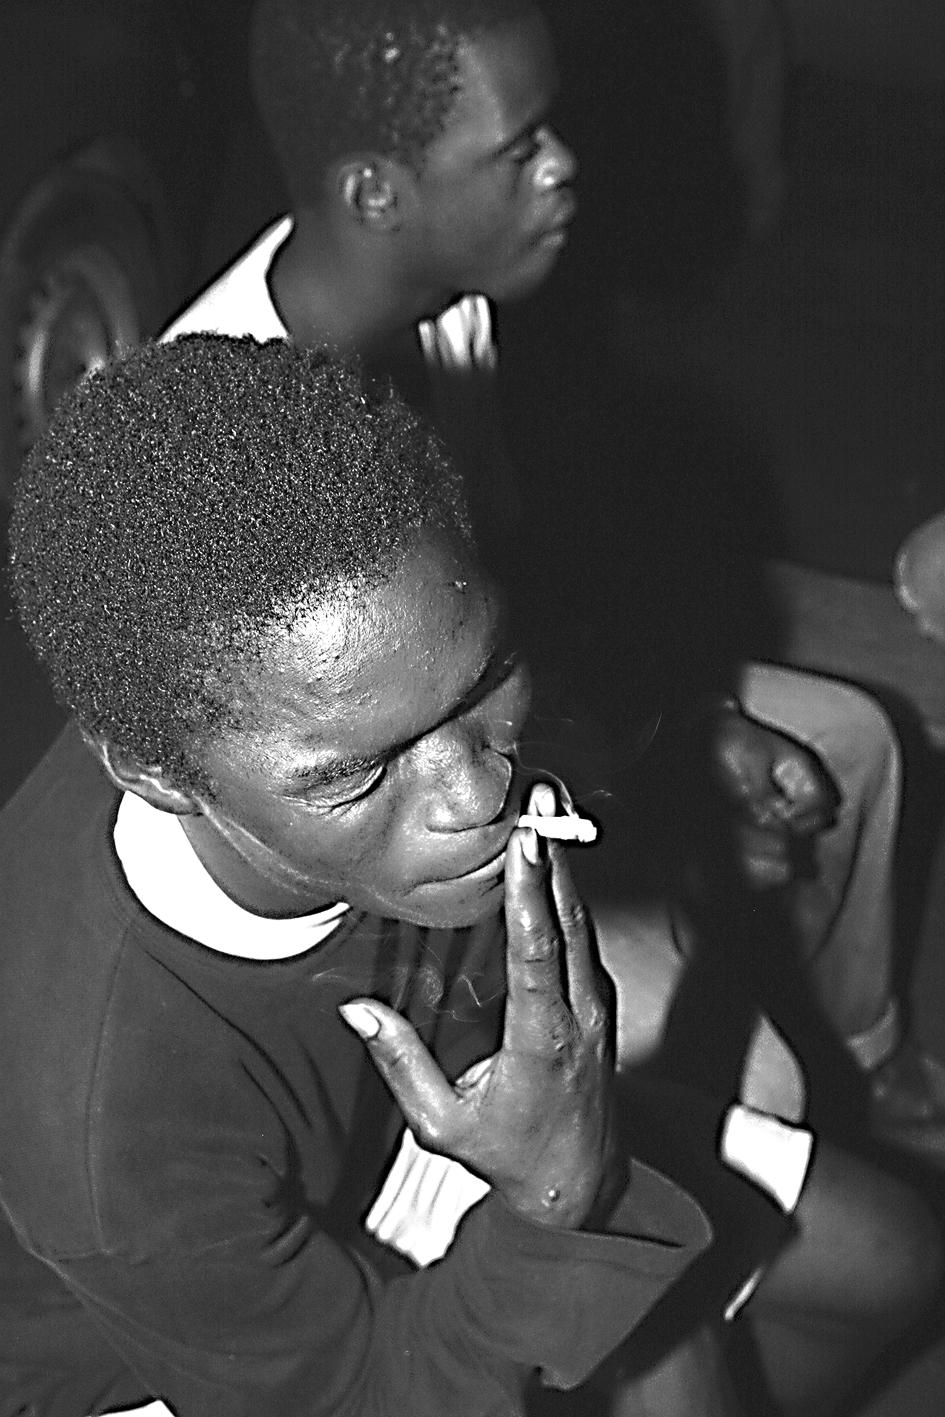 enfants soldats enfants de la rue enfant guerre